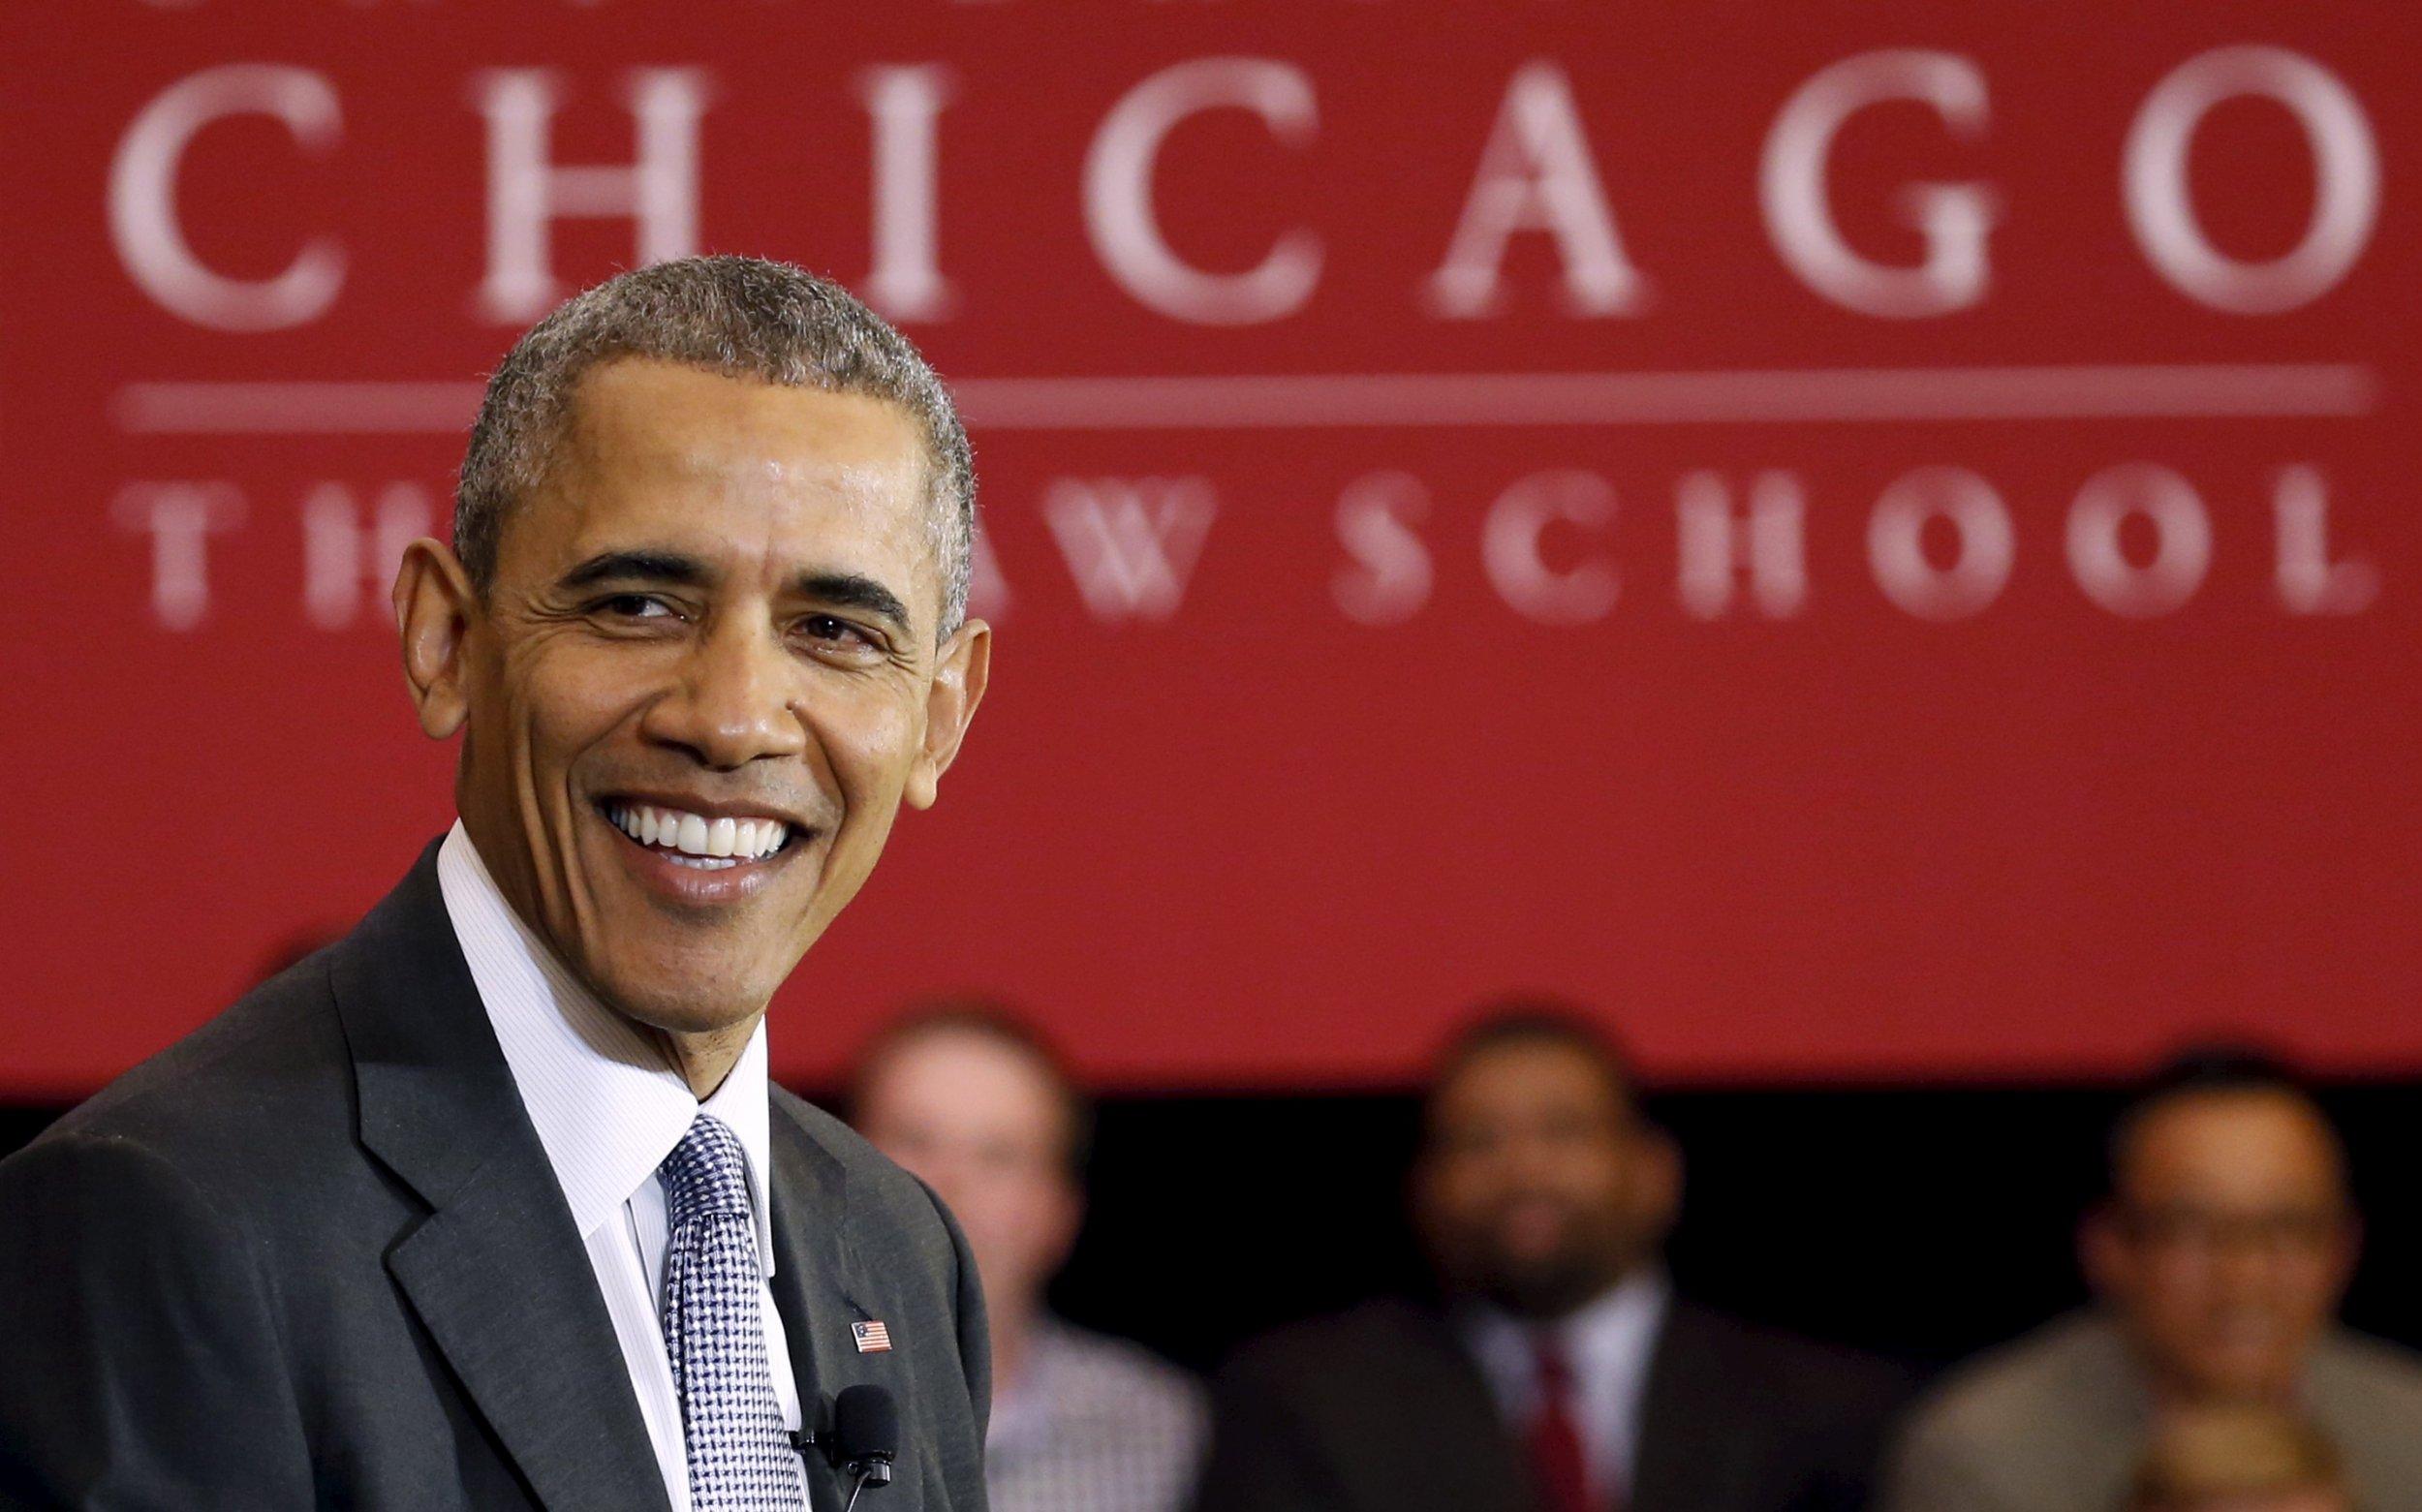 0407_Obama_Chicago_Supreme_Court_02